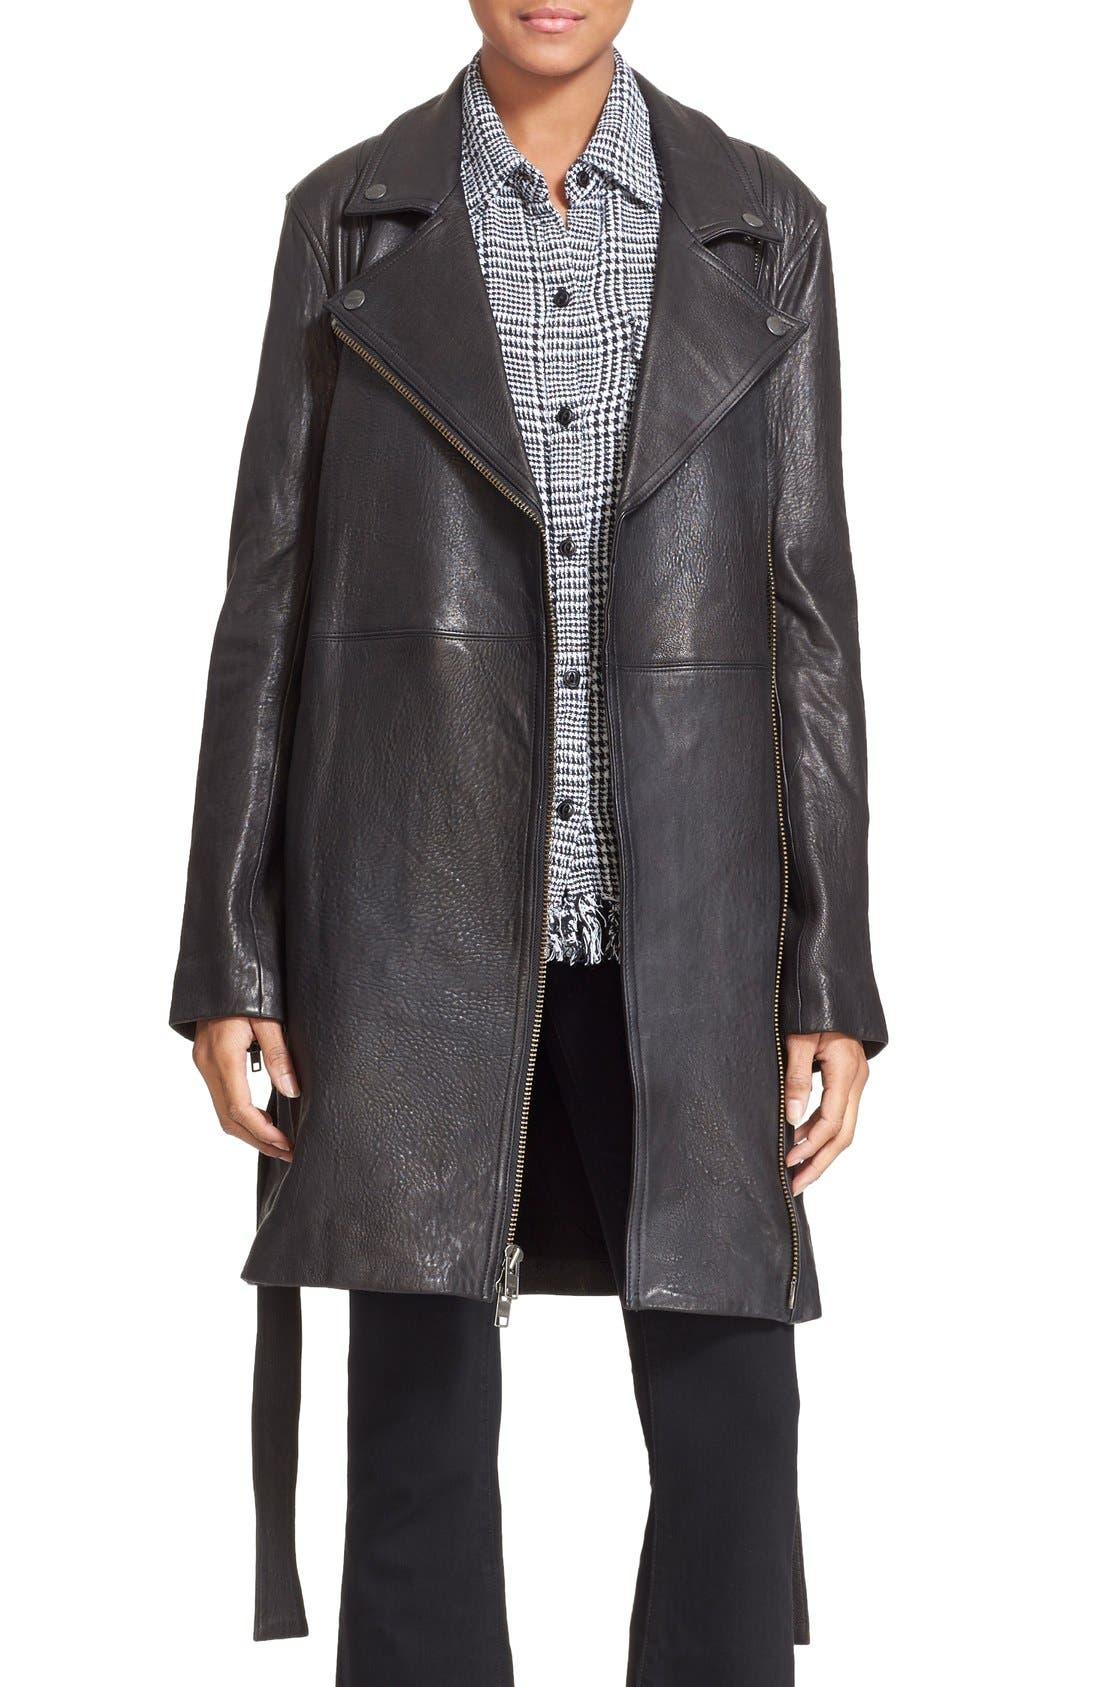 Alternate Image 1 Selected - Current/Elliott 'The Long Moto' Lambskin Leather Moto Trench Coat